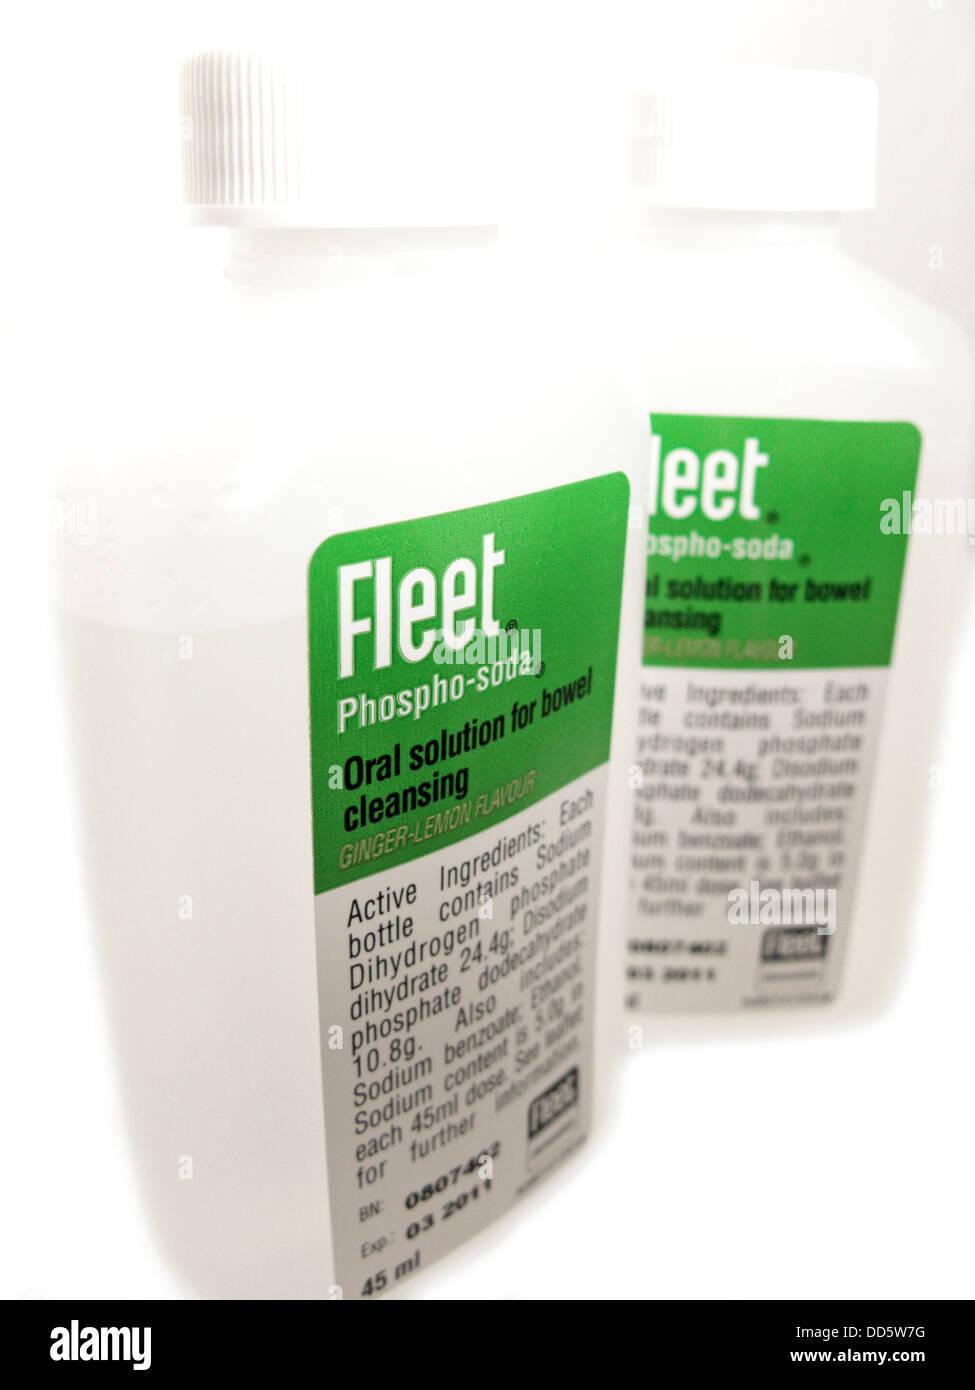 fleet bowel prep instructions